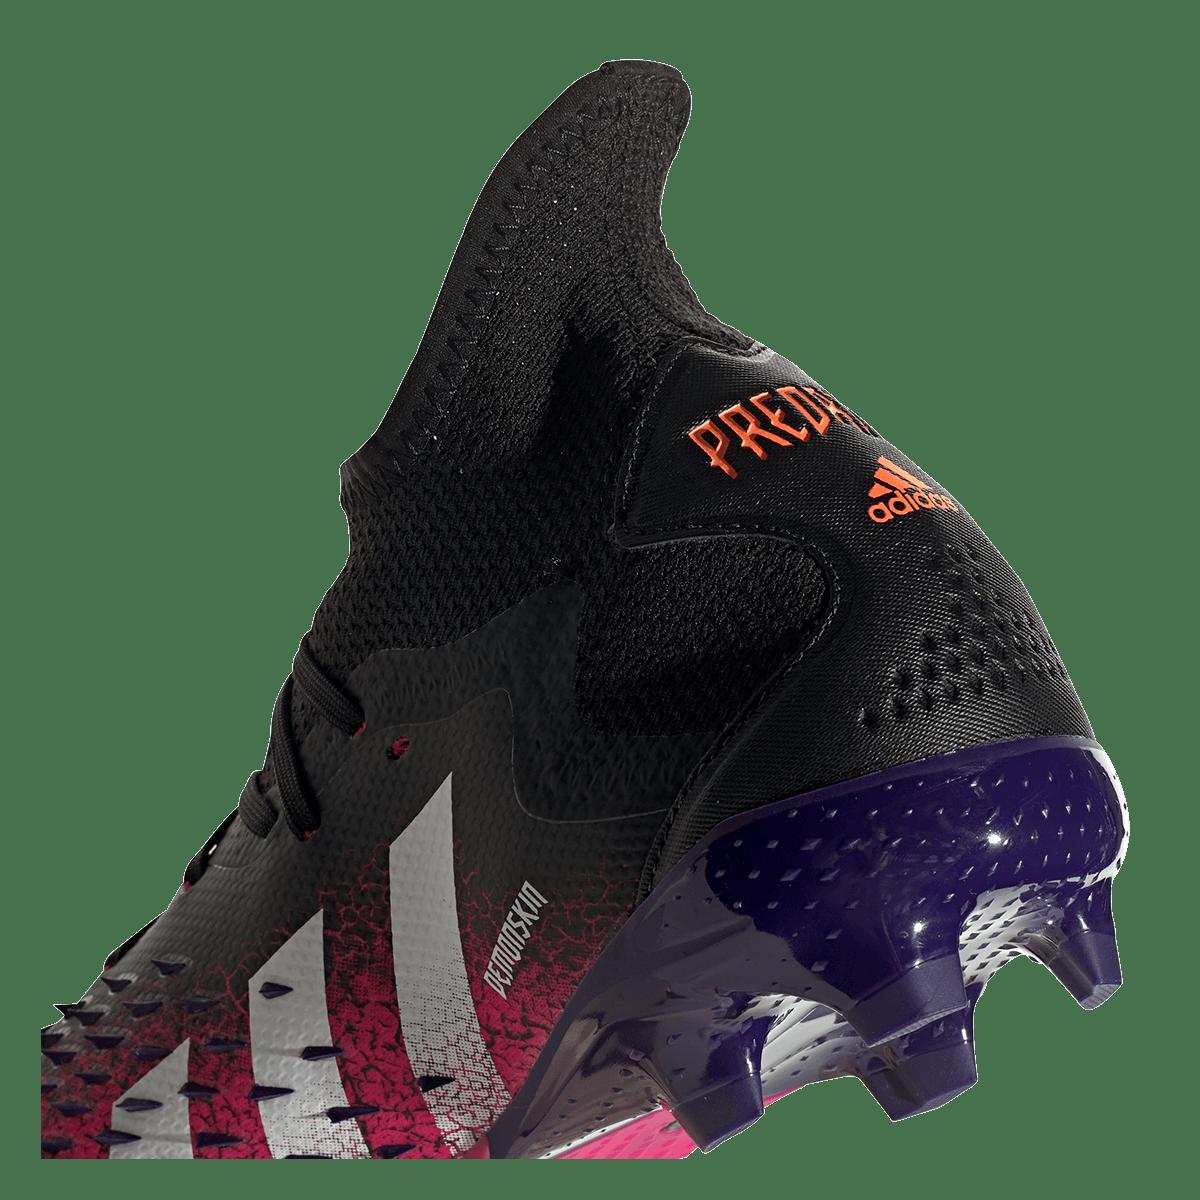 Chaussure de football adidas Predator Freak .2 FG noir / rose